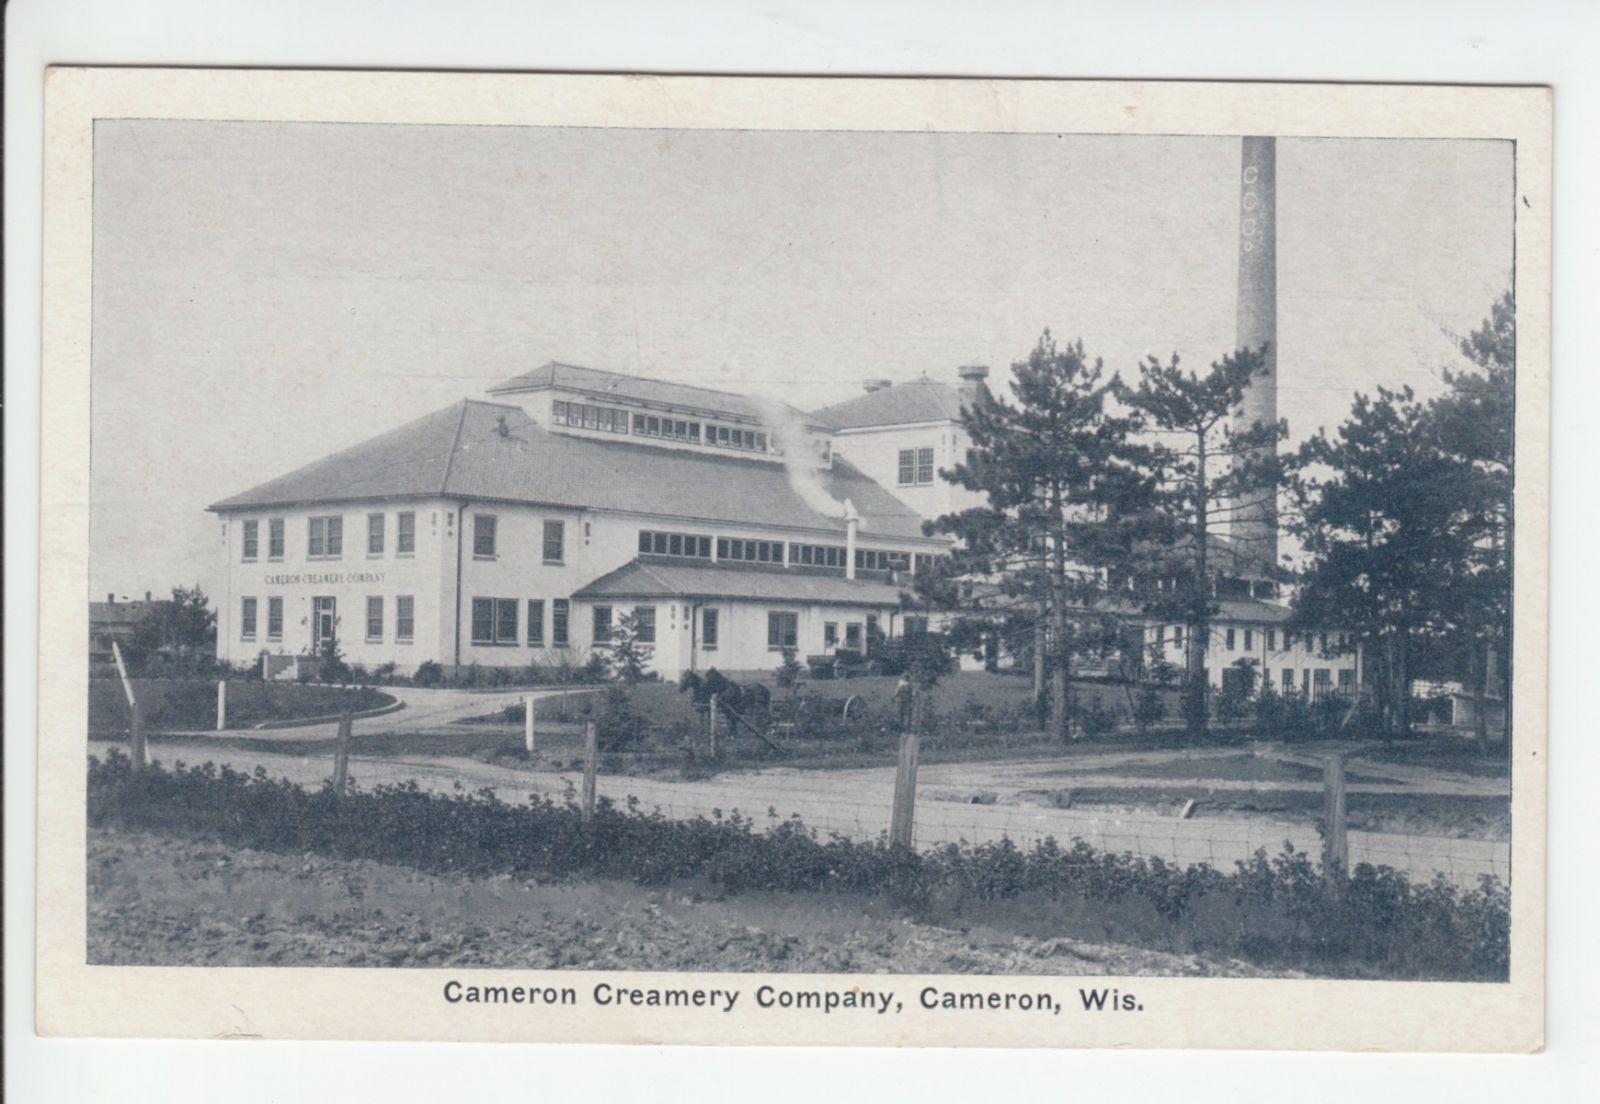 Cameron Creamery Company Dairy Wisconsin Barron County Wi Old Postcard Vintage | eBay